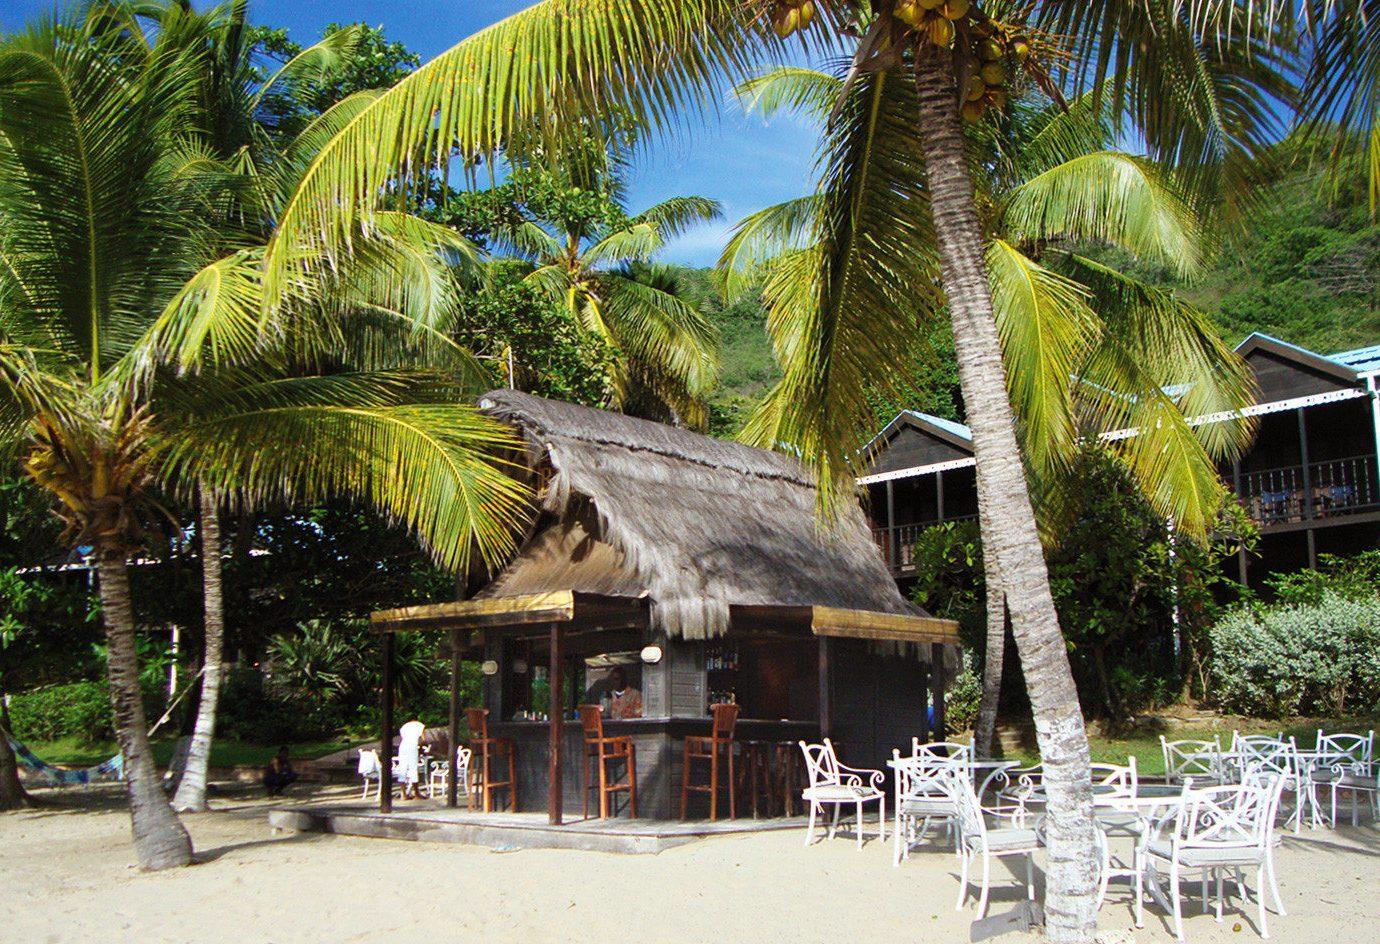 tree Resort Beach arecales caribbean palm family palm restaurant tropics plant lined shade